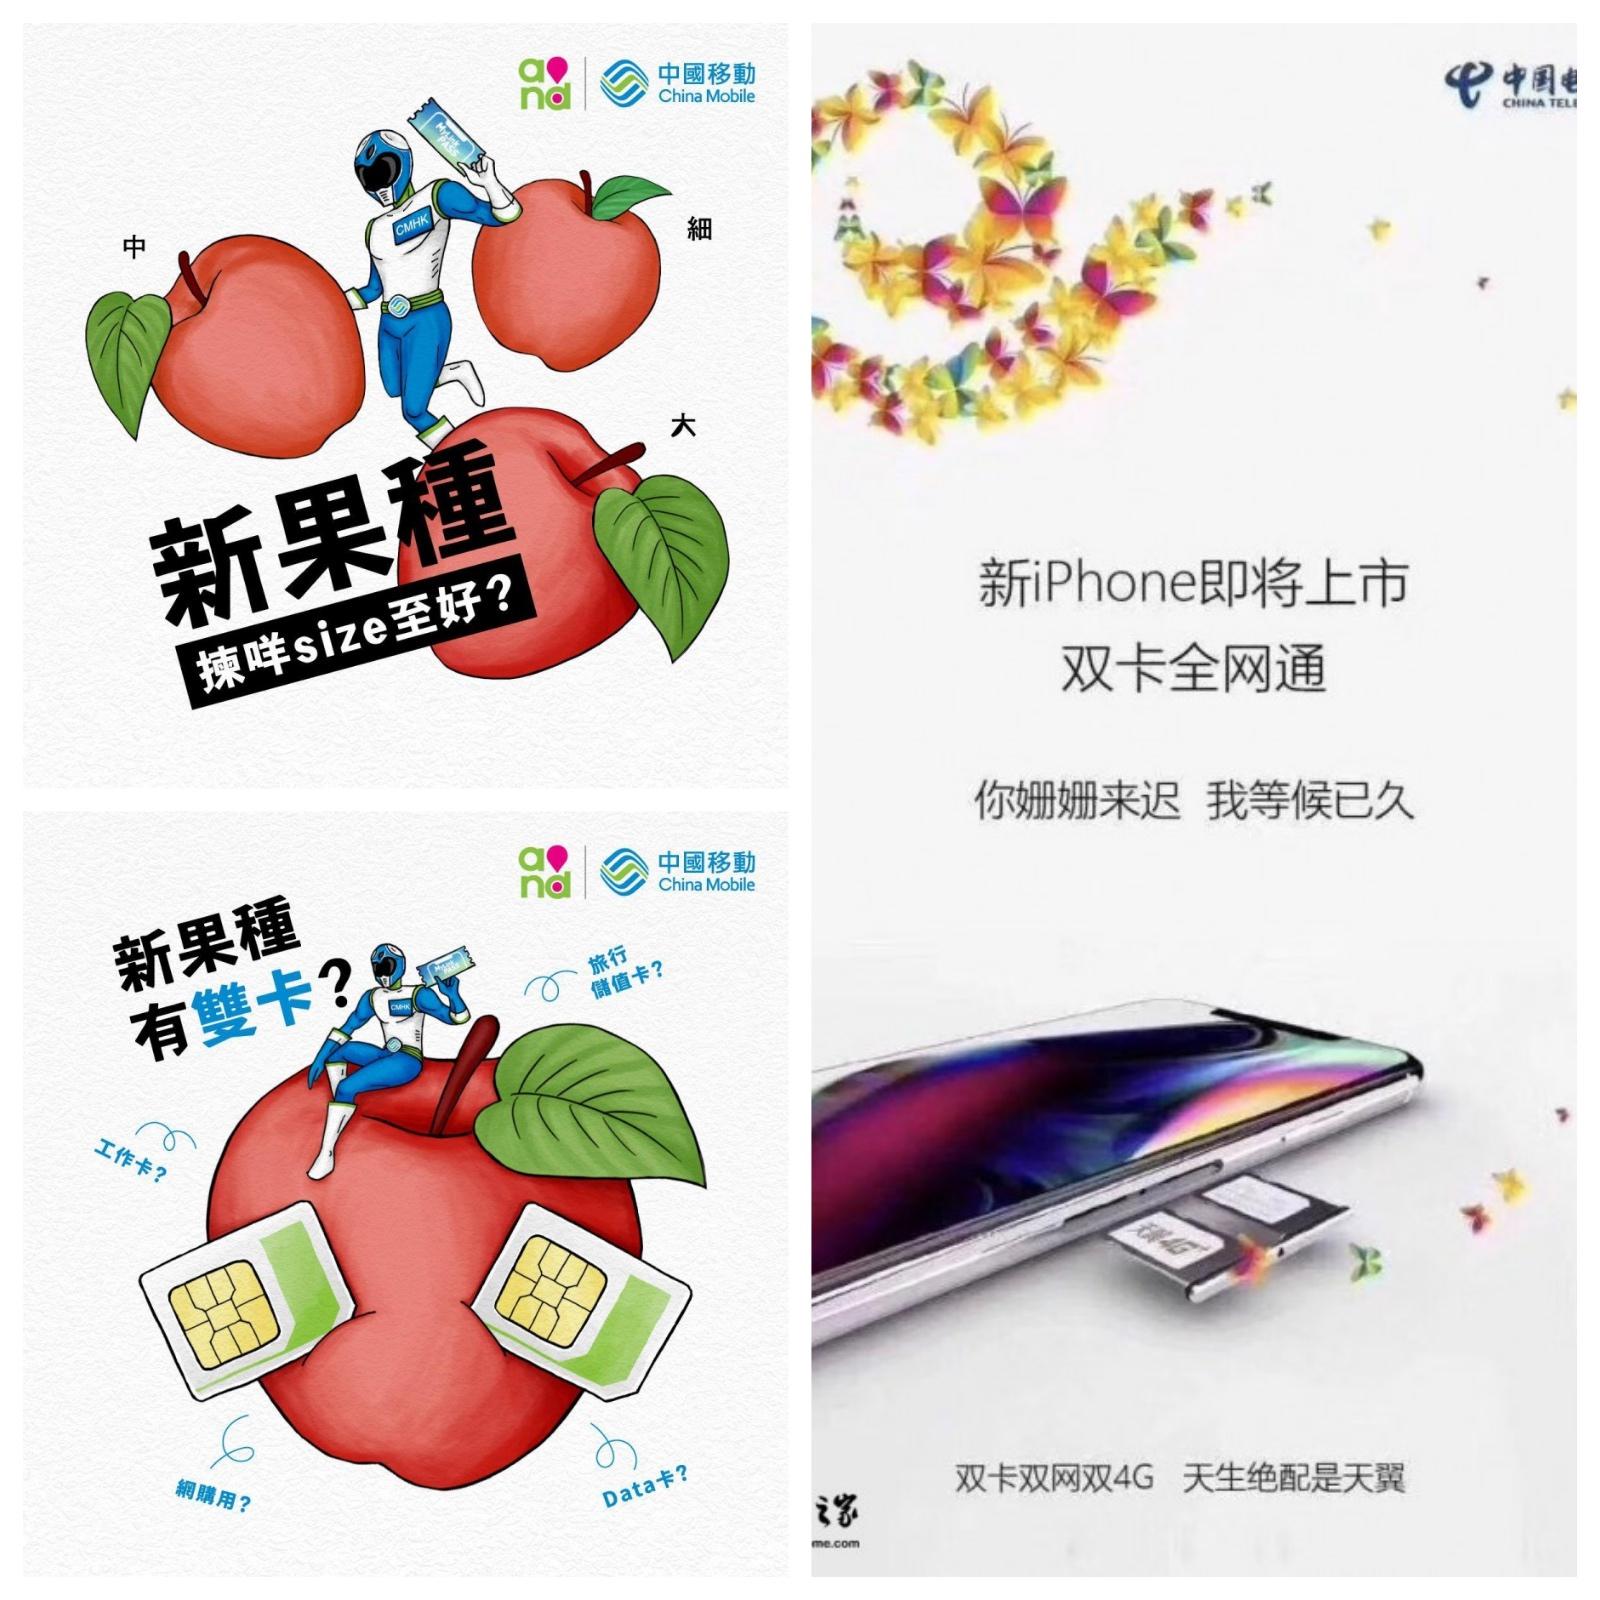 iphone-2018-with-dual-sim-teased.jpg